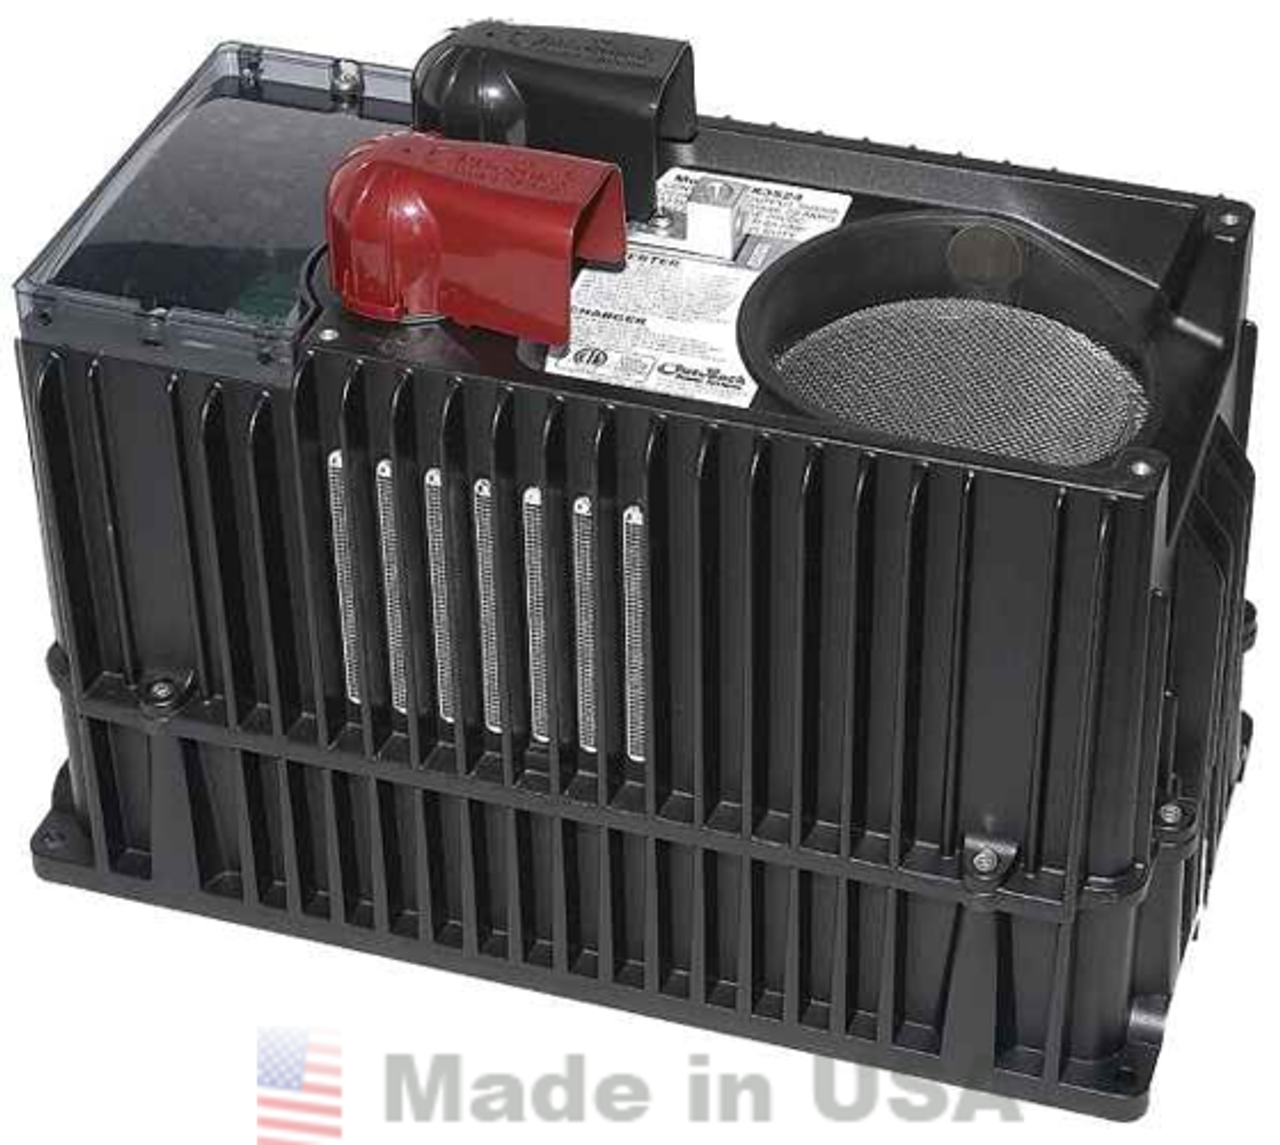 Outback Power VFX2812M Vented Off Grid Mobile/Marine Inverter/Charger